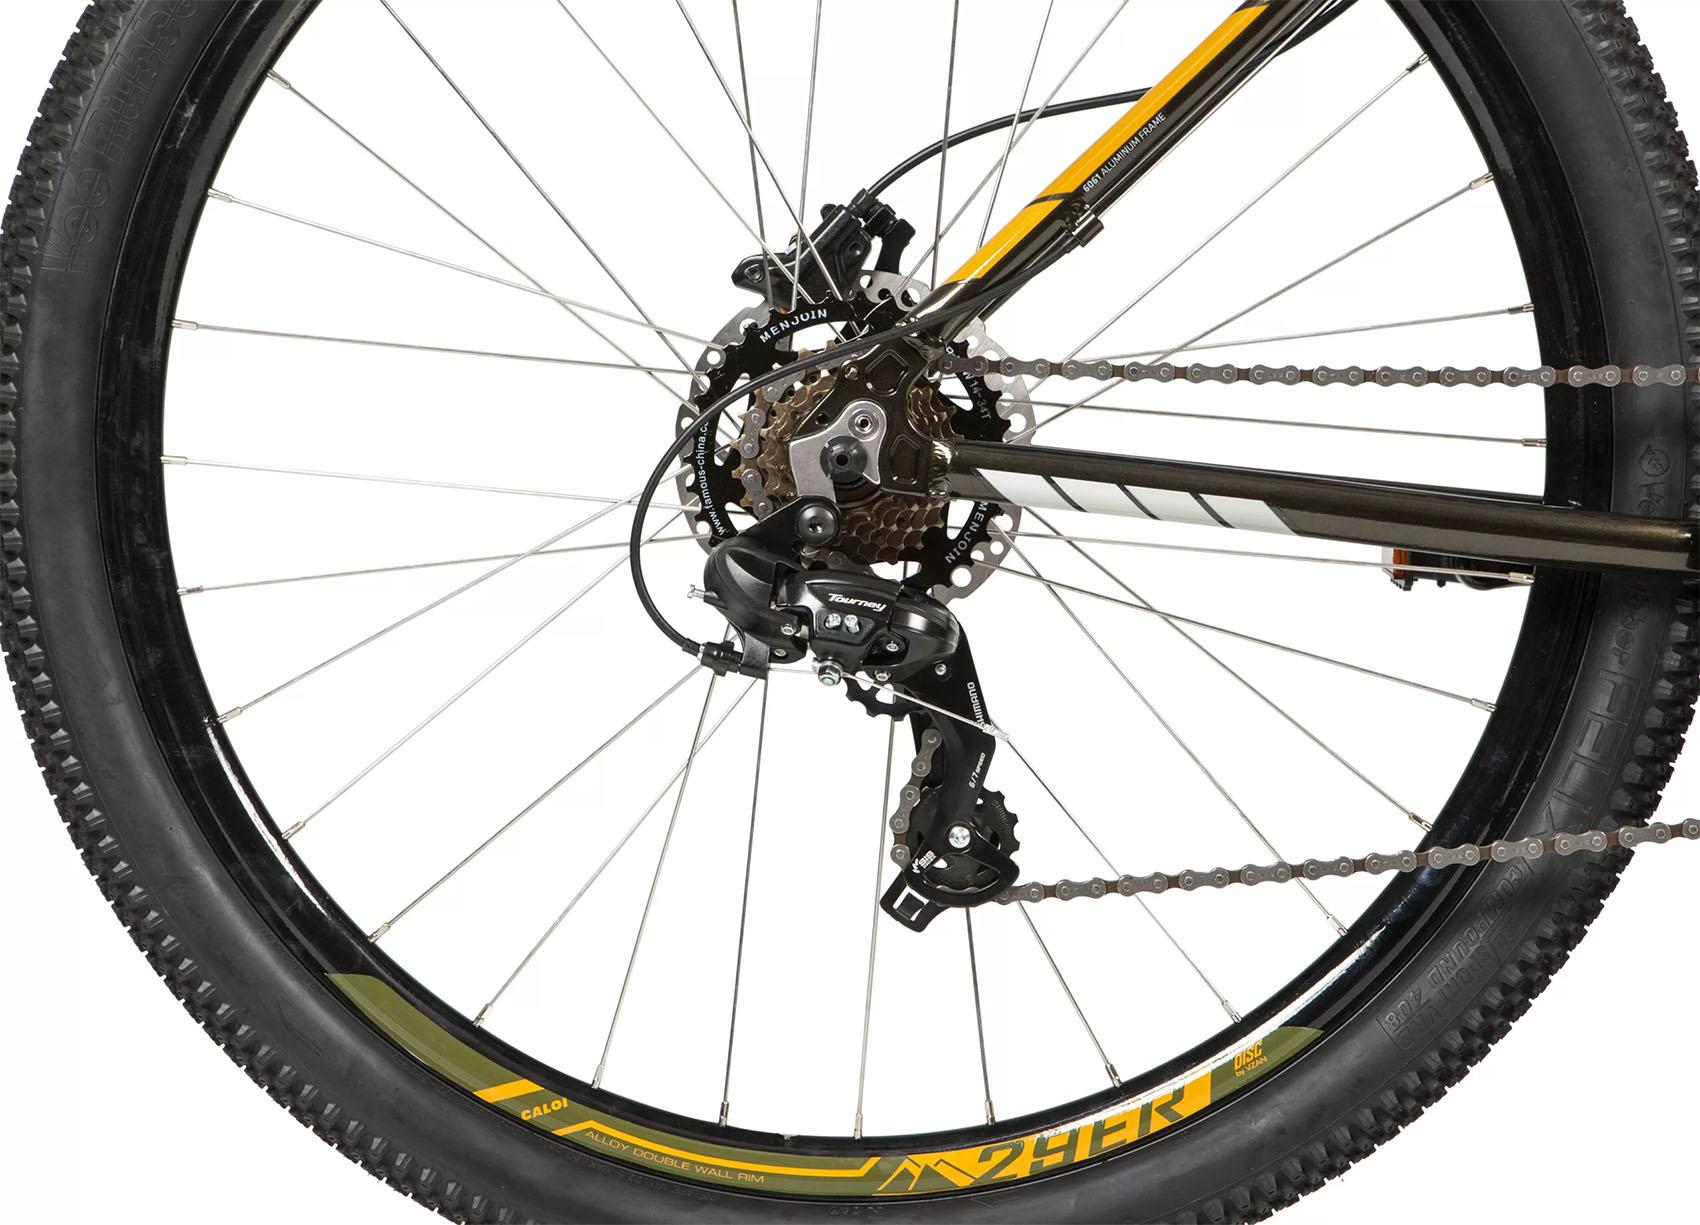 Bicicleta 29 TWO NINER PRO - Caloi